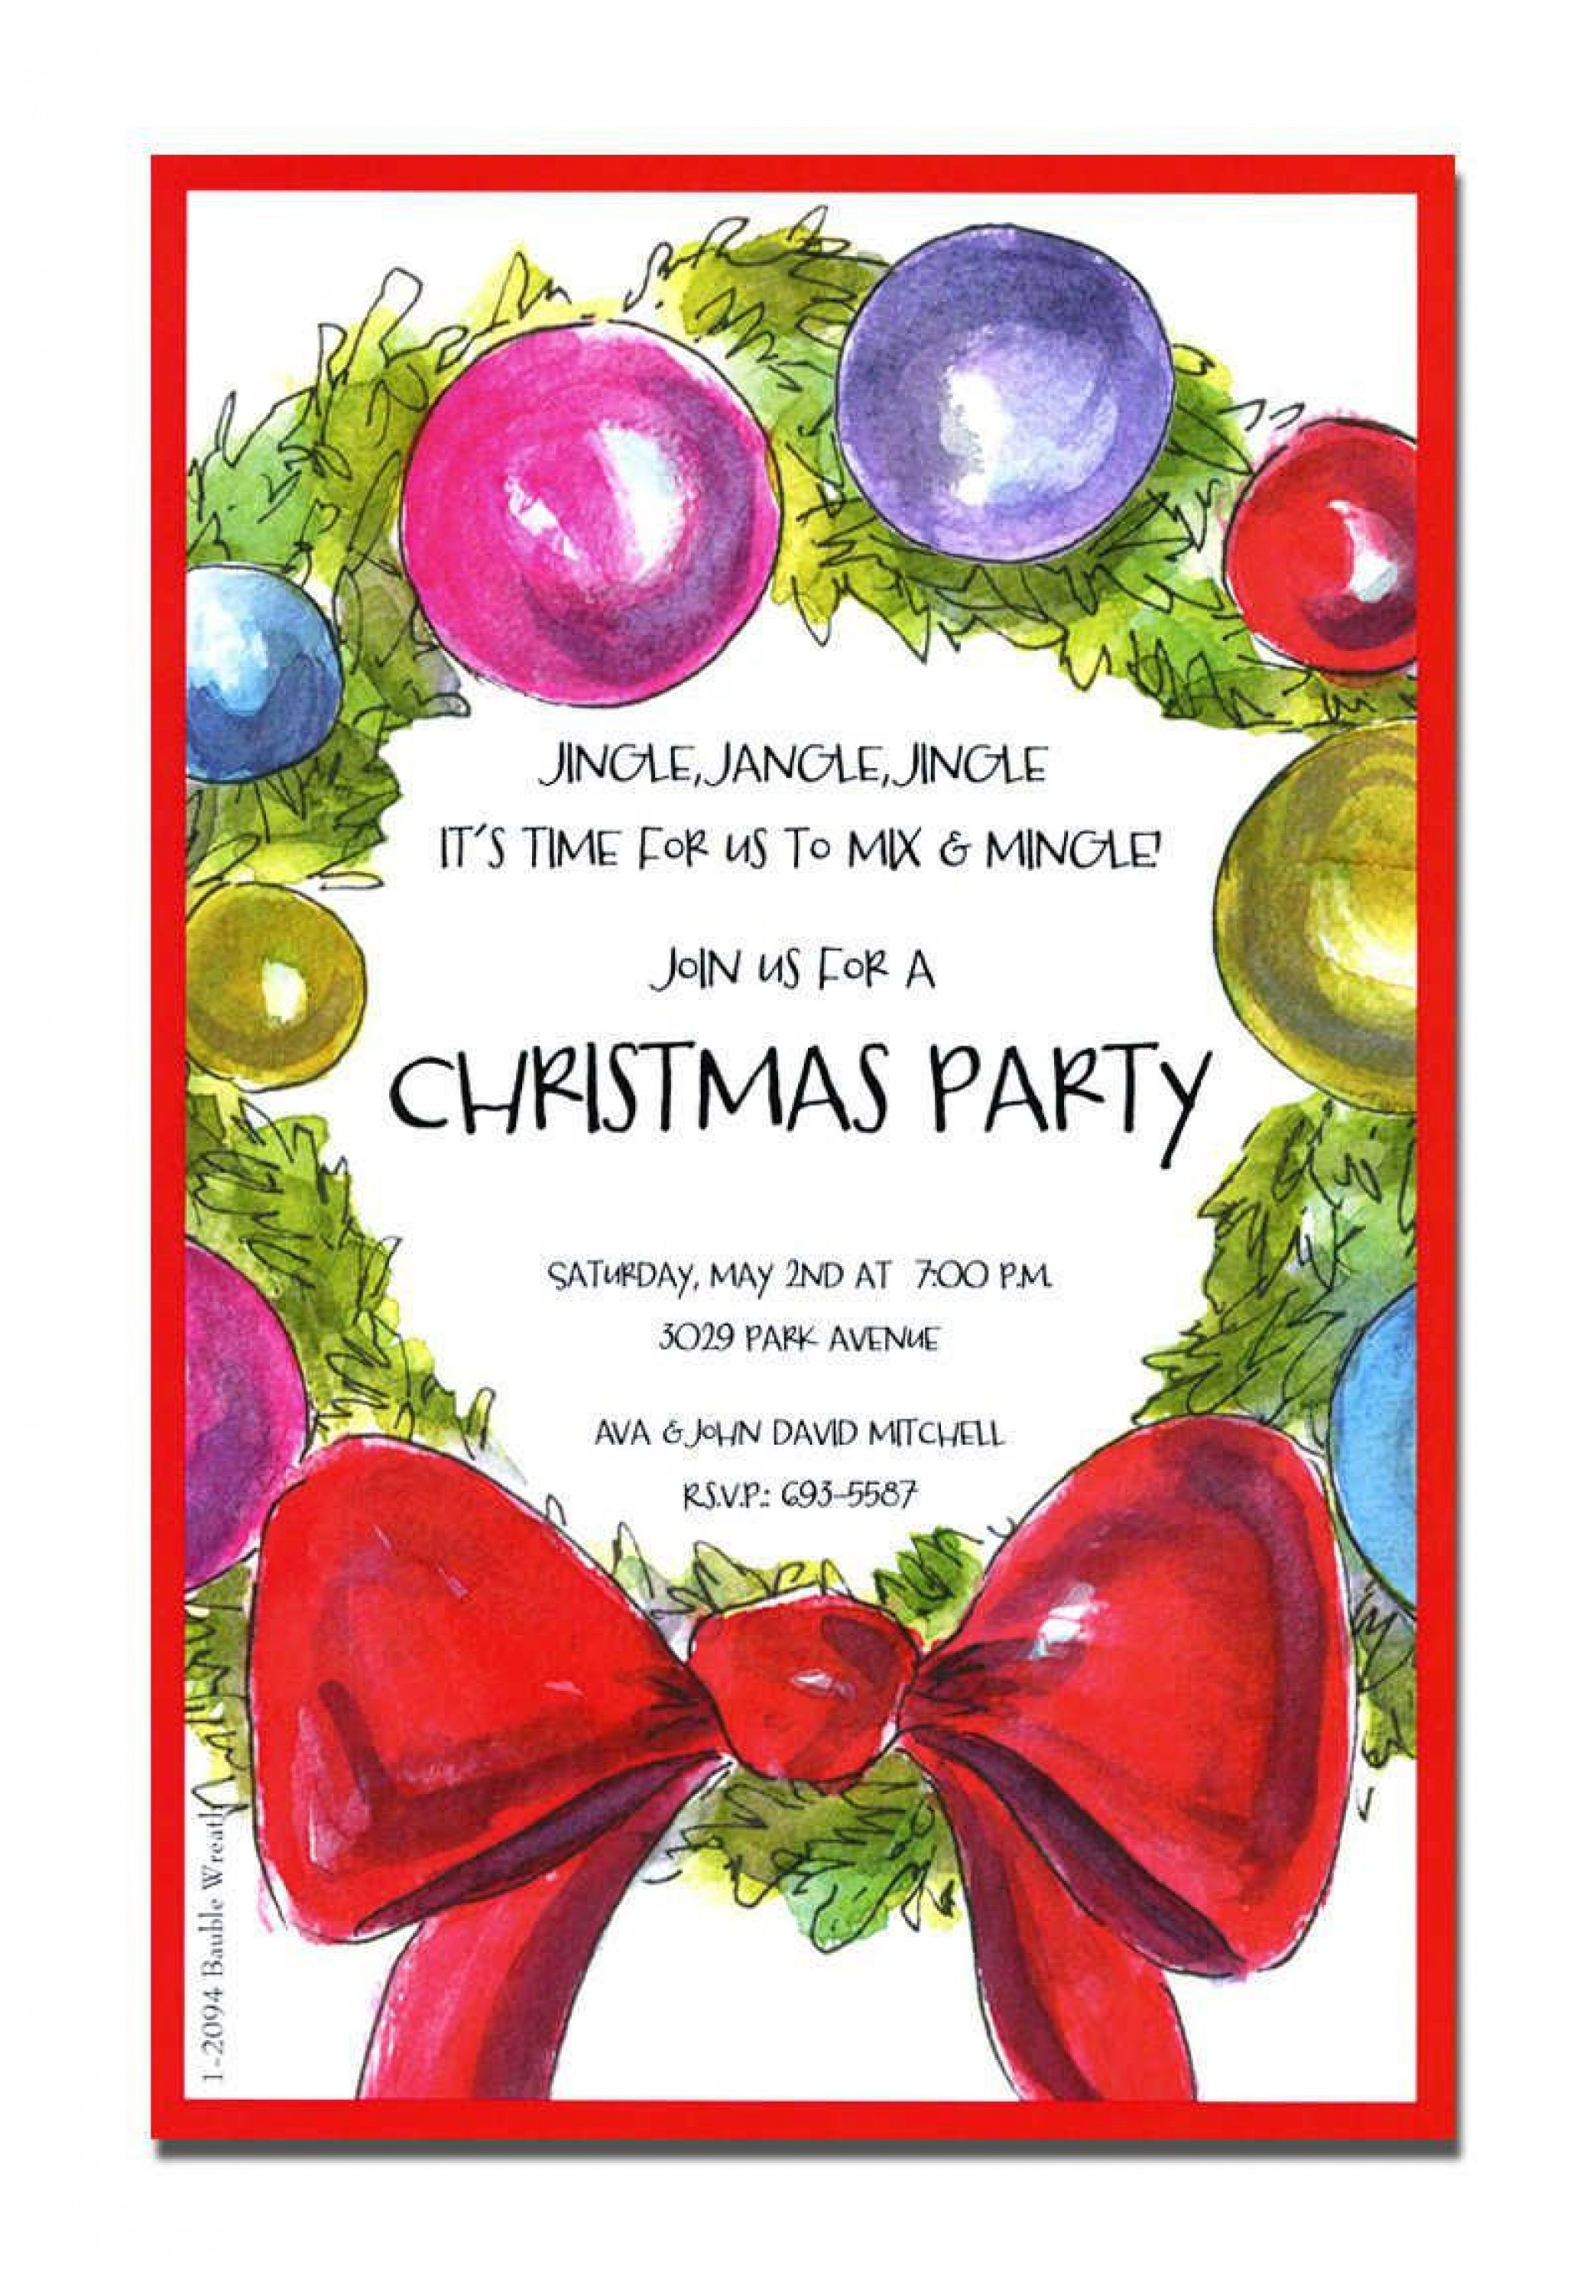 004 Stunning Holiday Open House Invitation Template Sample  Christma Free Printable Wording Idea1920